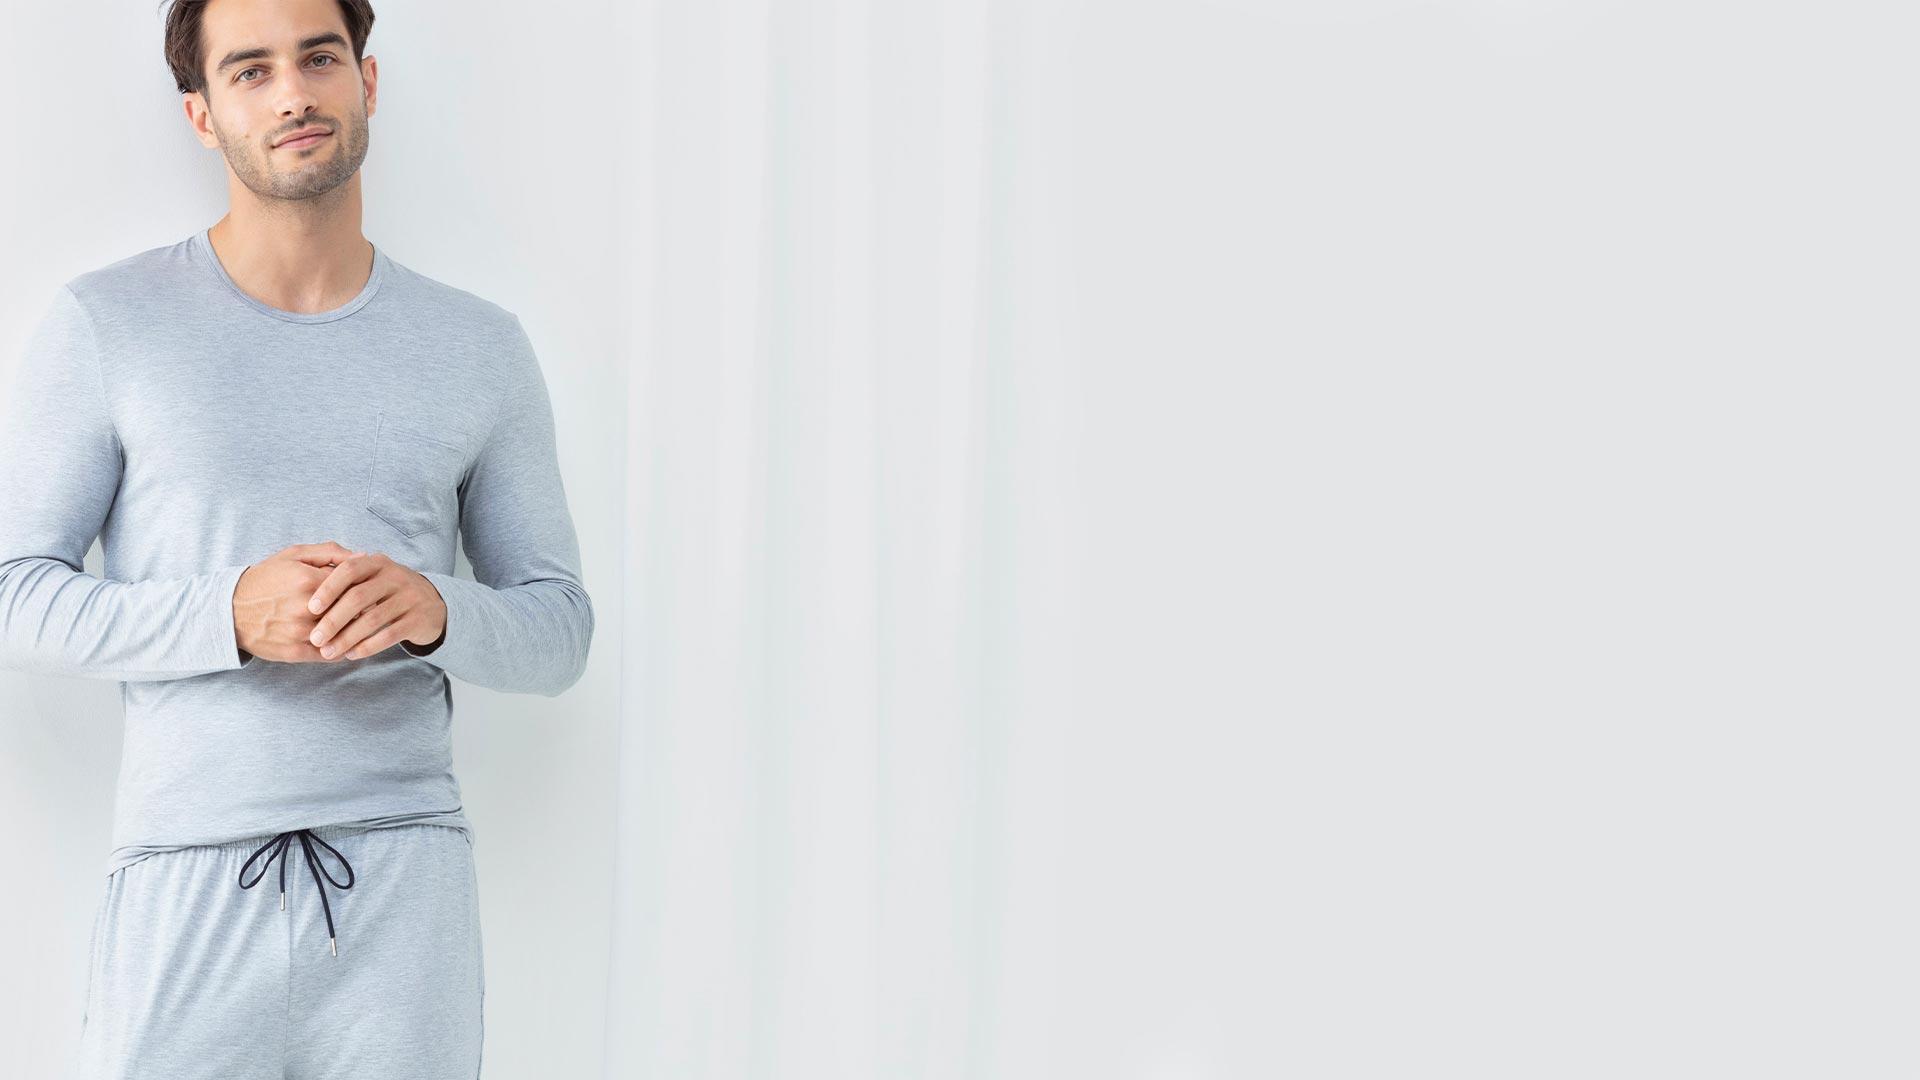 Individuelle Looks mit Homewear Shirts | mey®